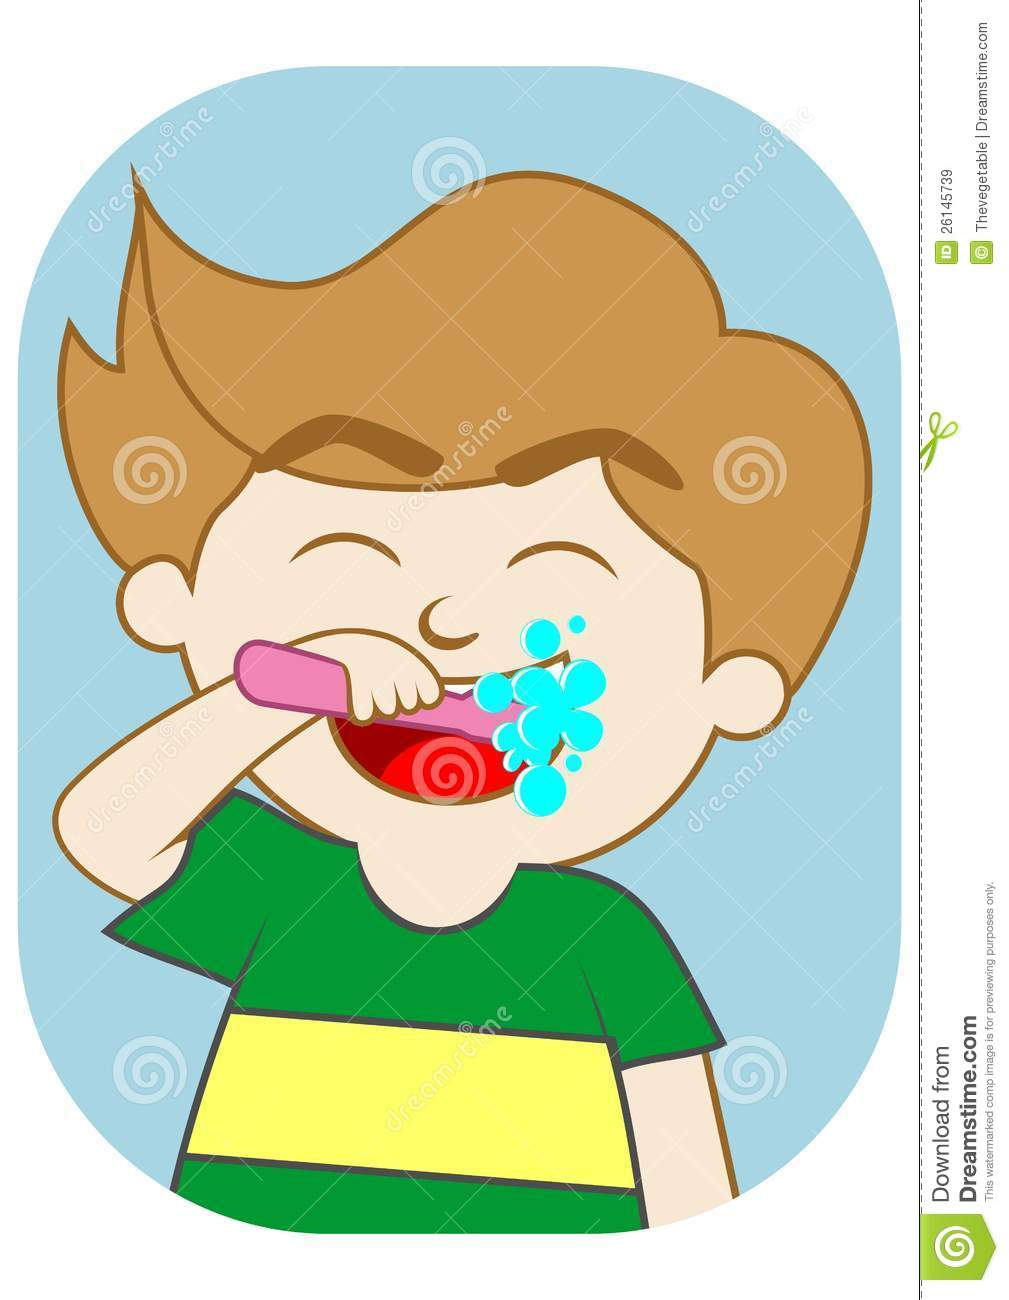 Brush Your Teeth Clipart.